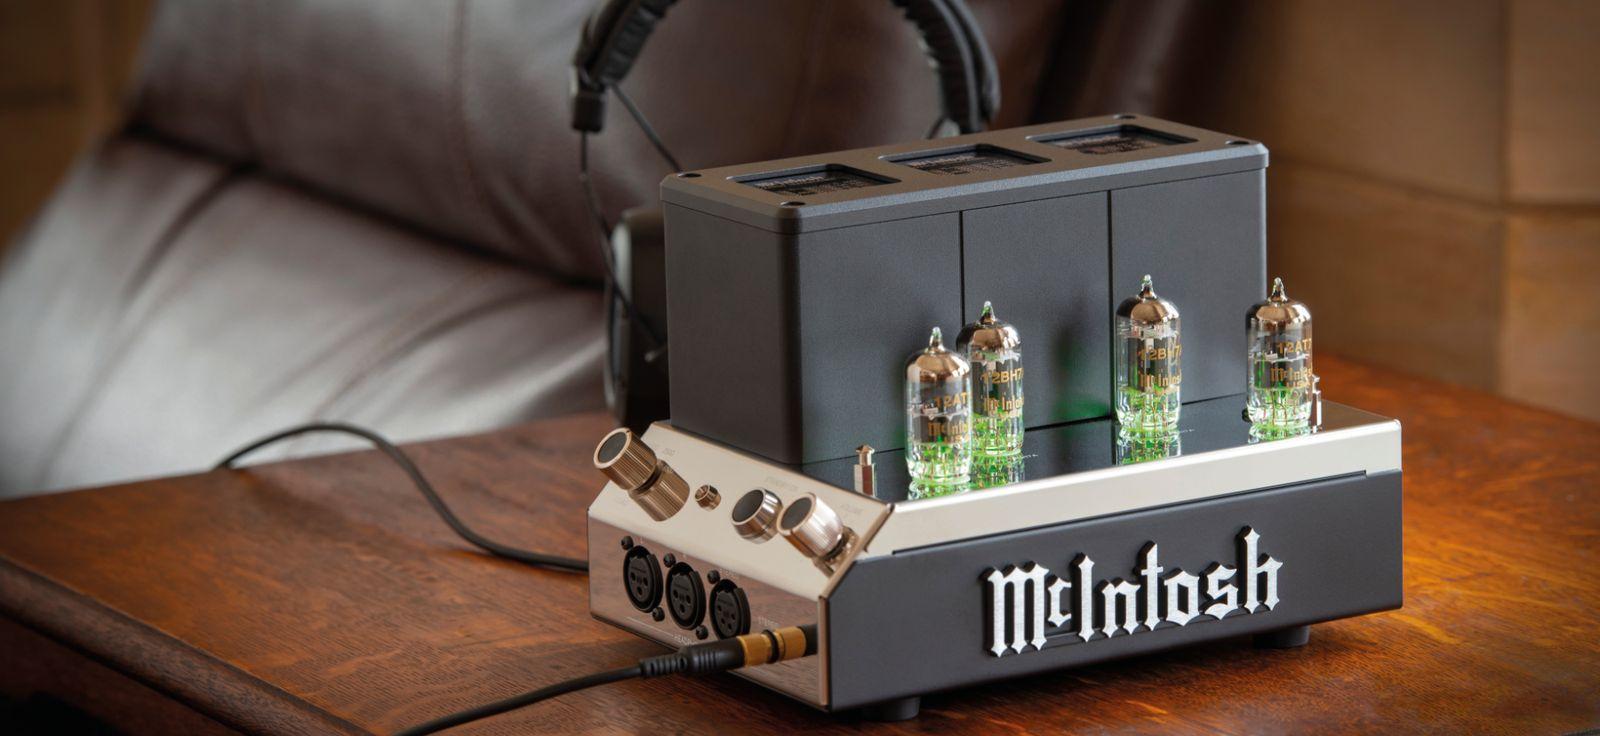 McIntosh MHA200 Valve Headphone Amplifier launches